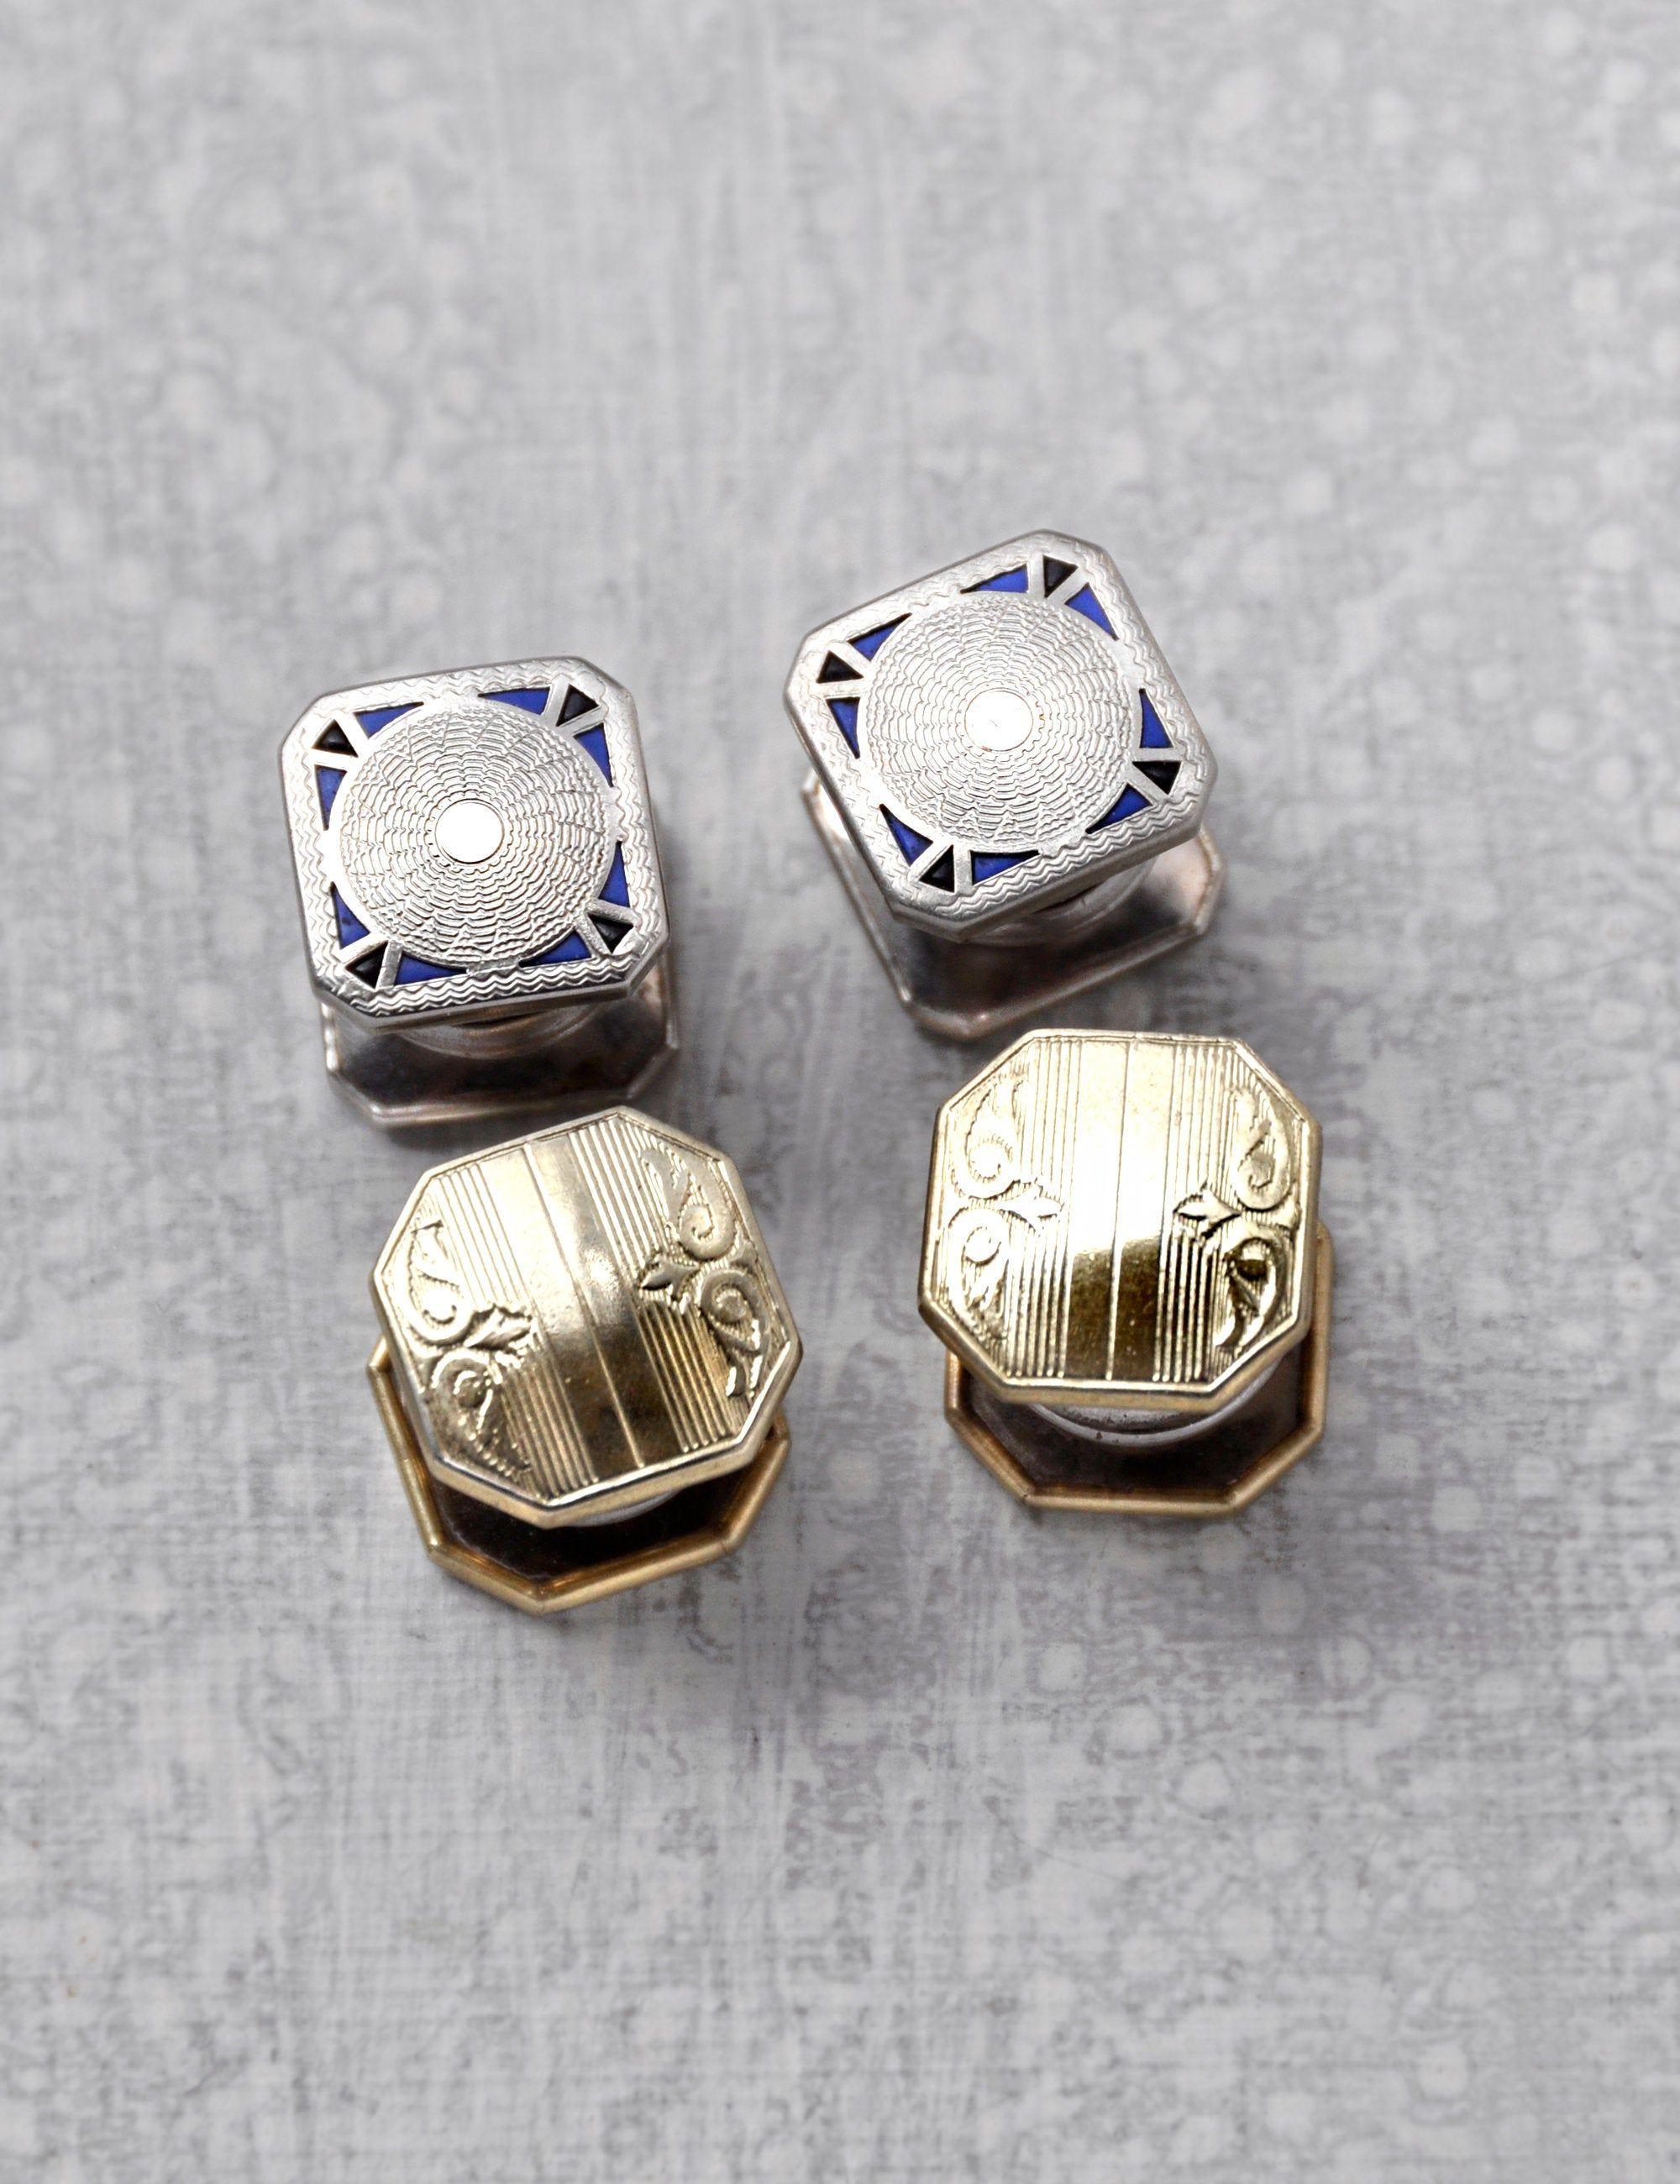 EDWARDIAN Antique 1920s Silver DRAGON/'S BREATH Art Glass Cuff Links /& Stickpin Downton Nouveau Cufflinks Jabot Pin 3 pc Vintage Jewelry Set